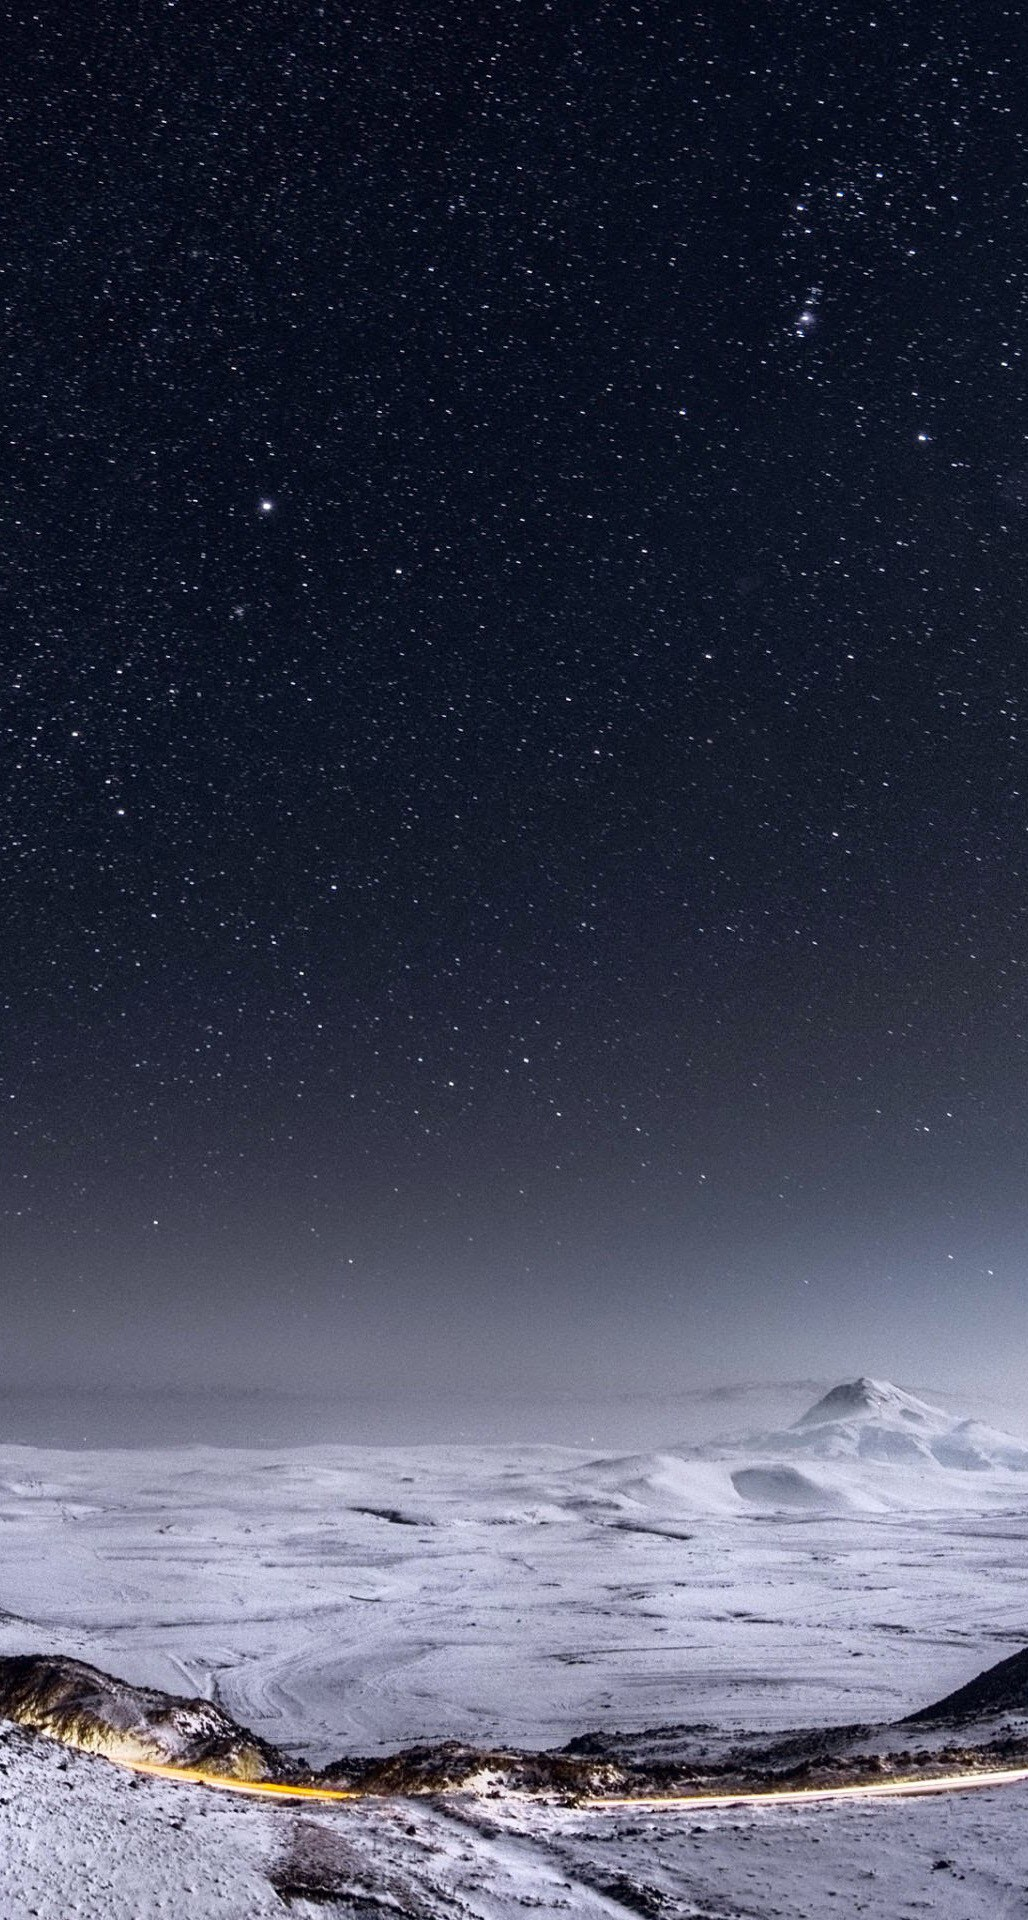 Night Stars Mountain Range Winter Landscape iPhone 6 Plus HD Wallpaper 1028x1920